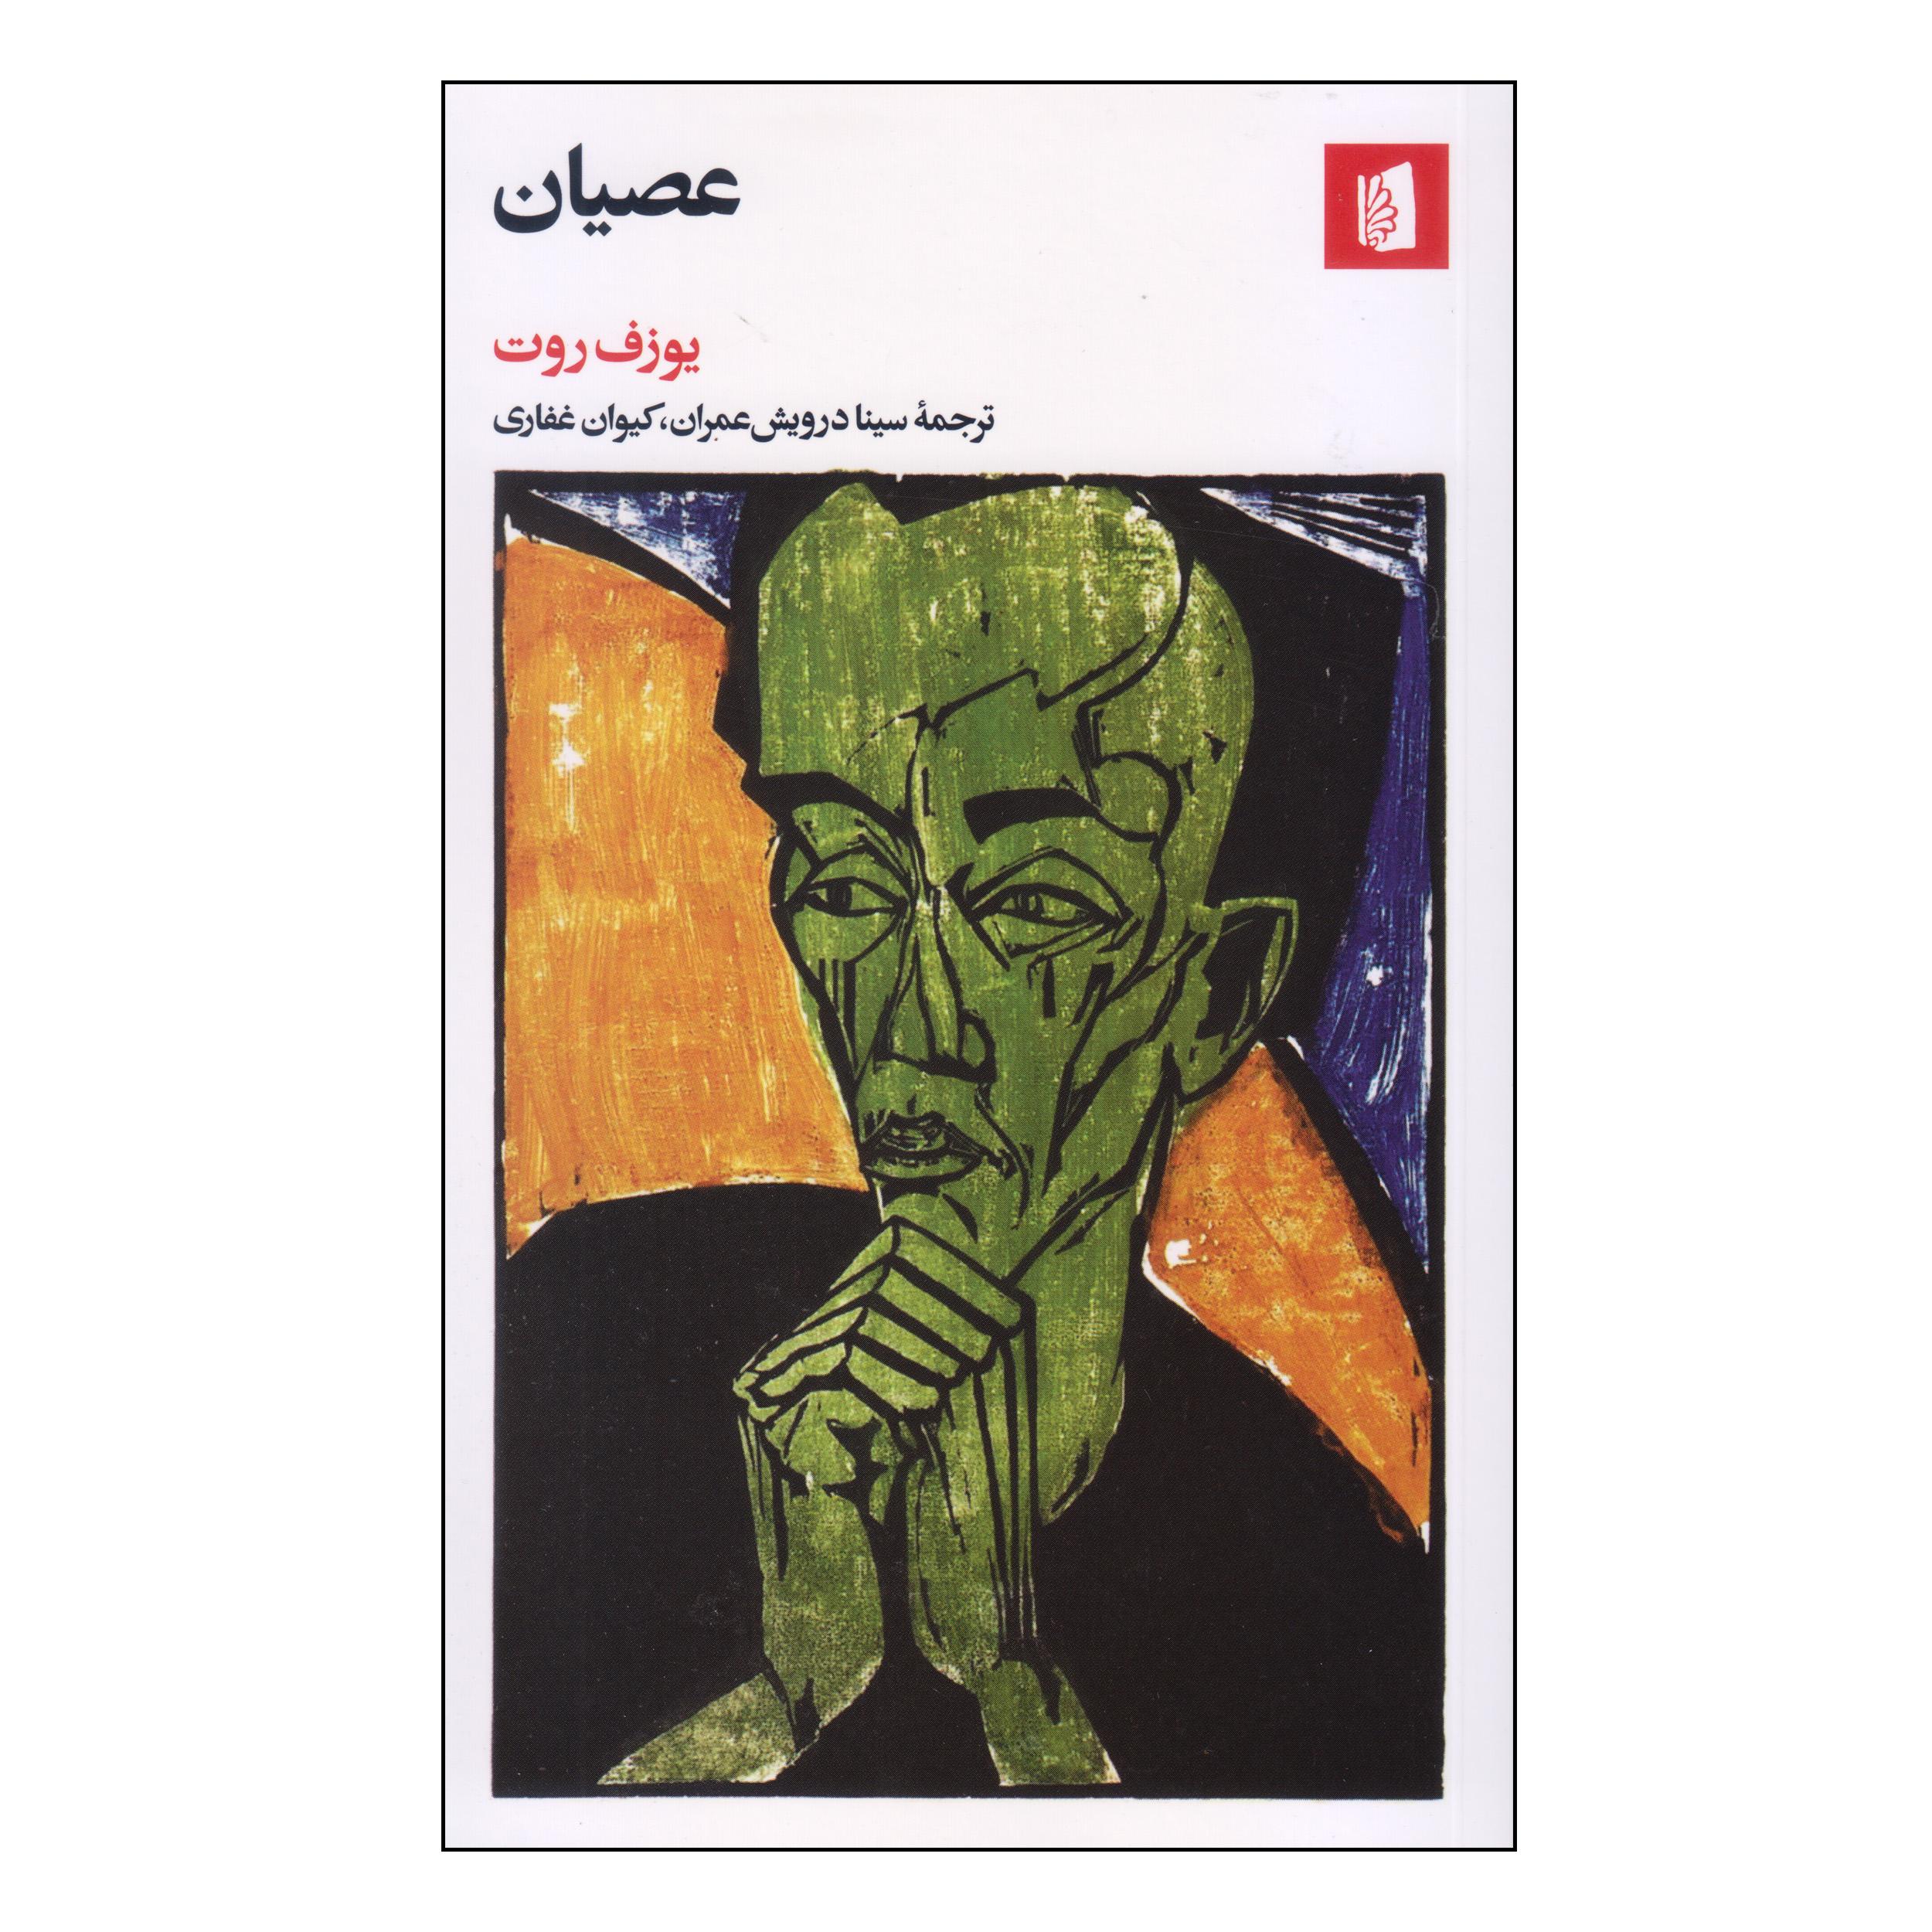 خرید                      کتاب عصیان اثر یوزف روت نشر بیدگل